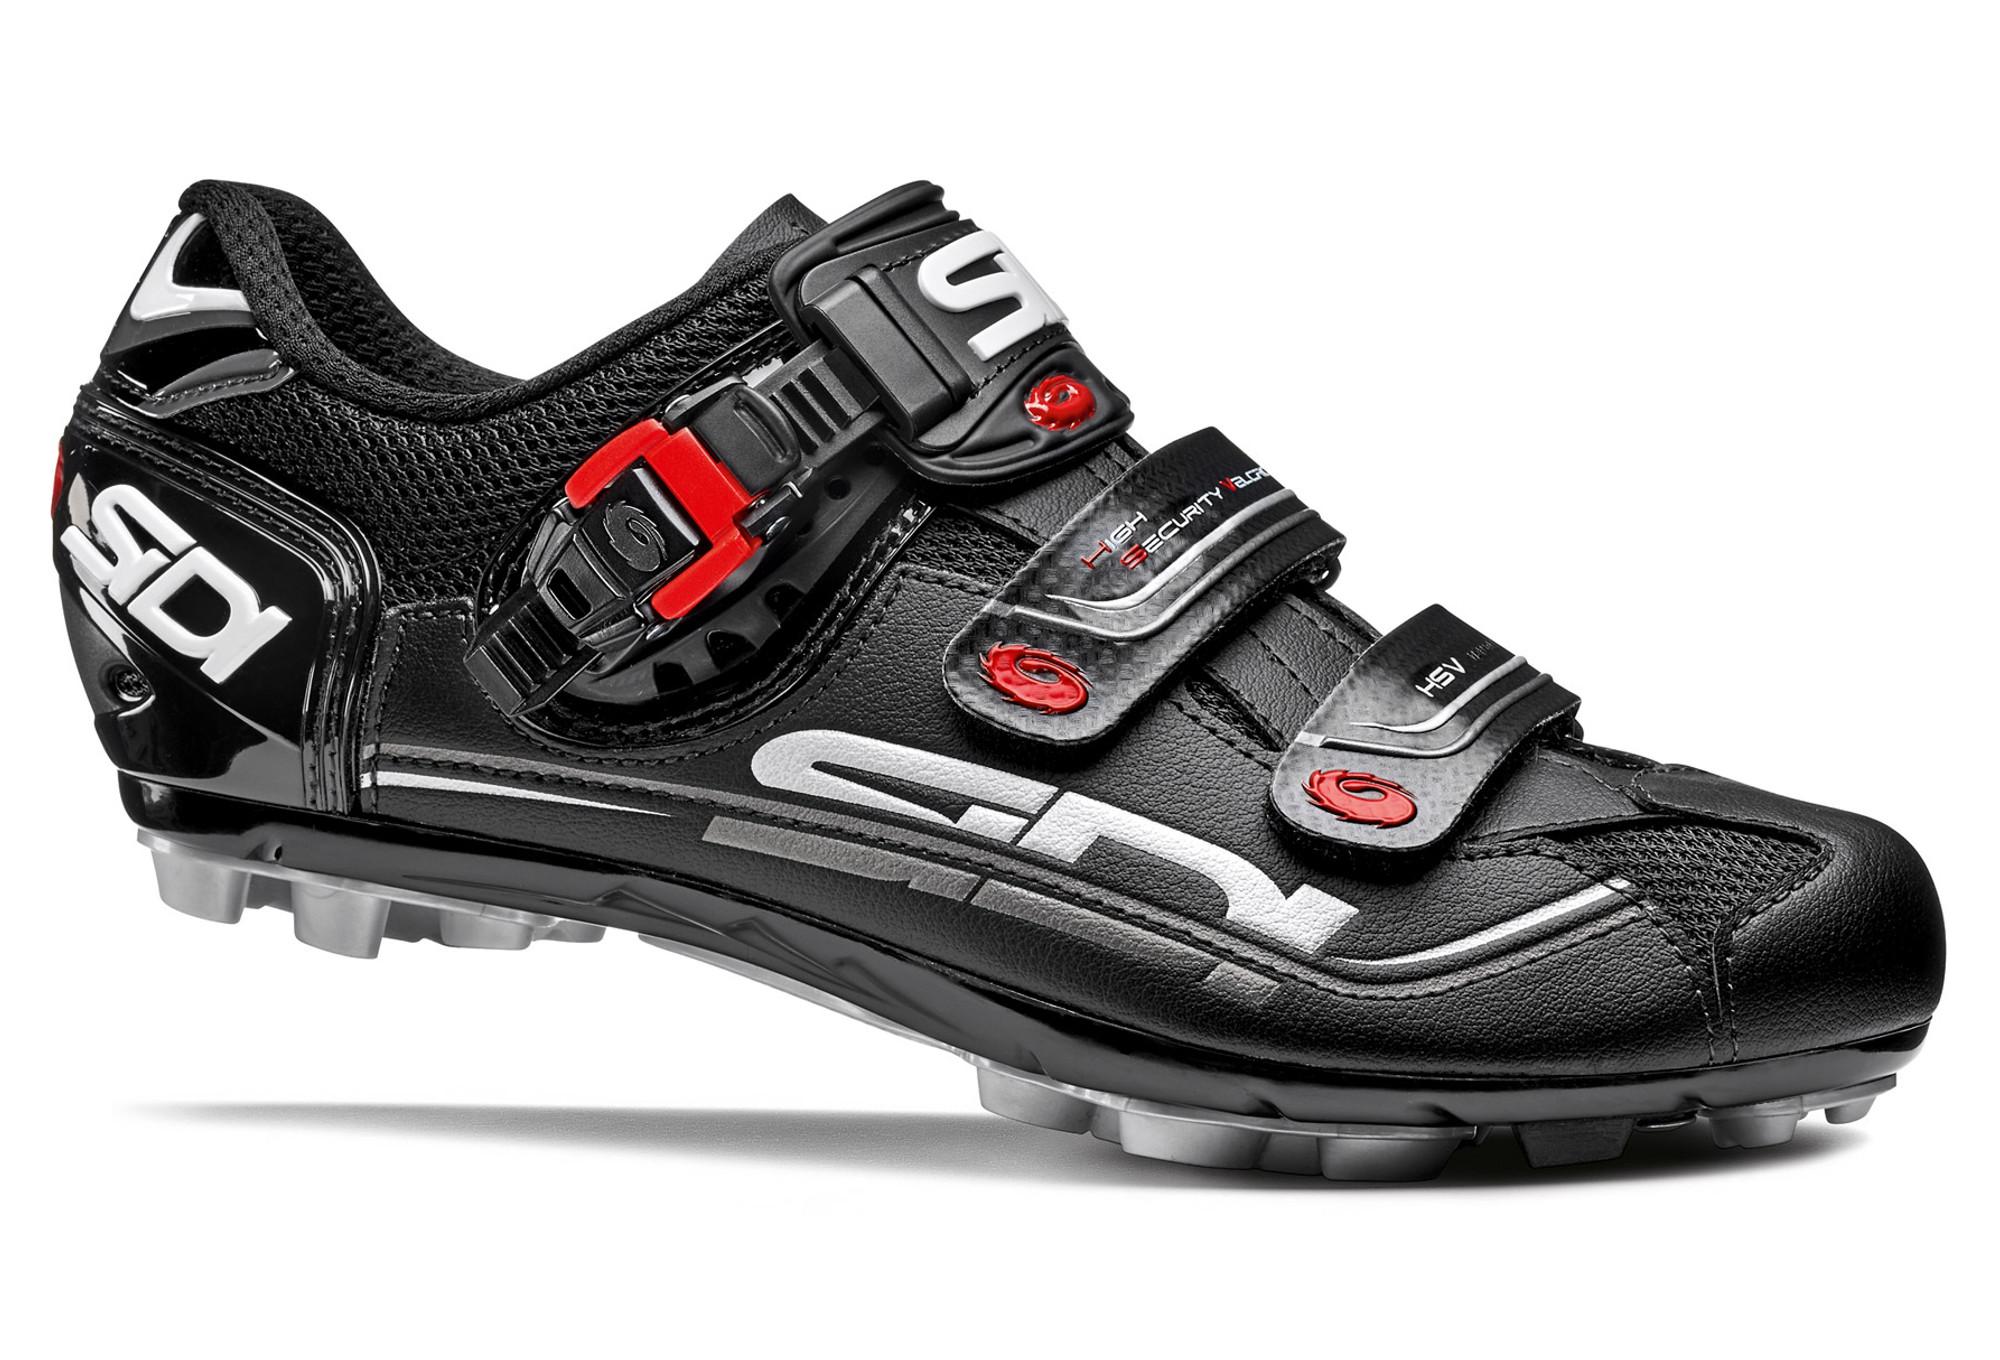 Chaussures VTT Sidi Eagle 7 Noir